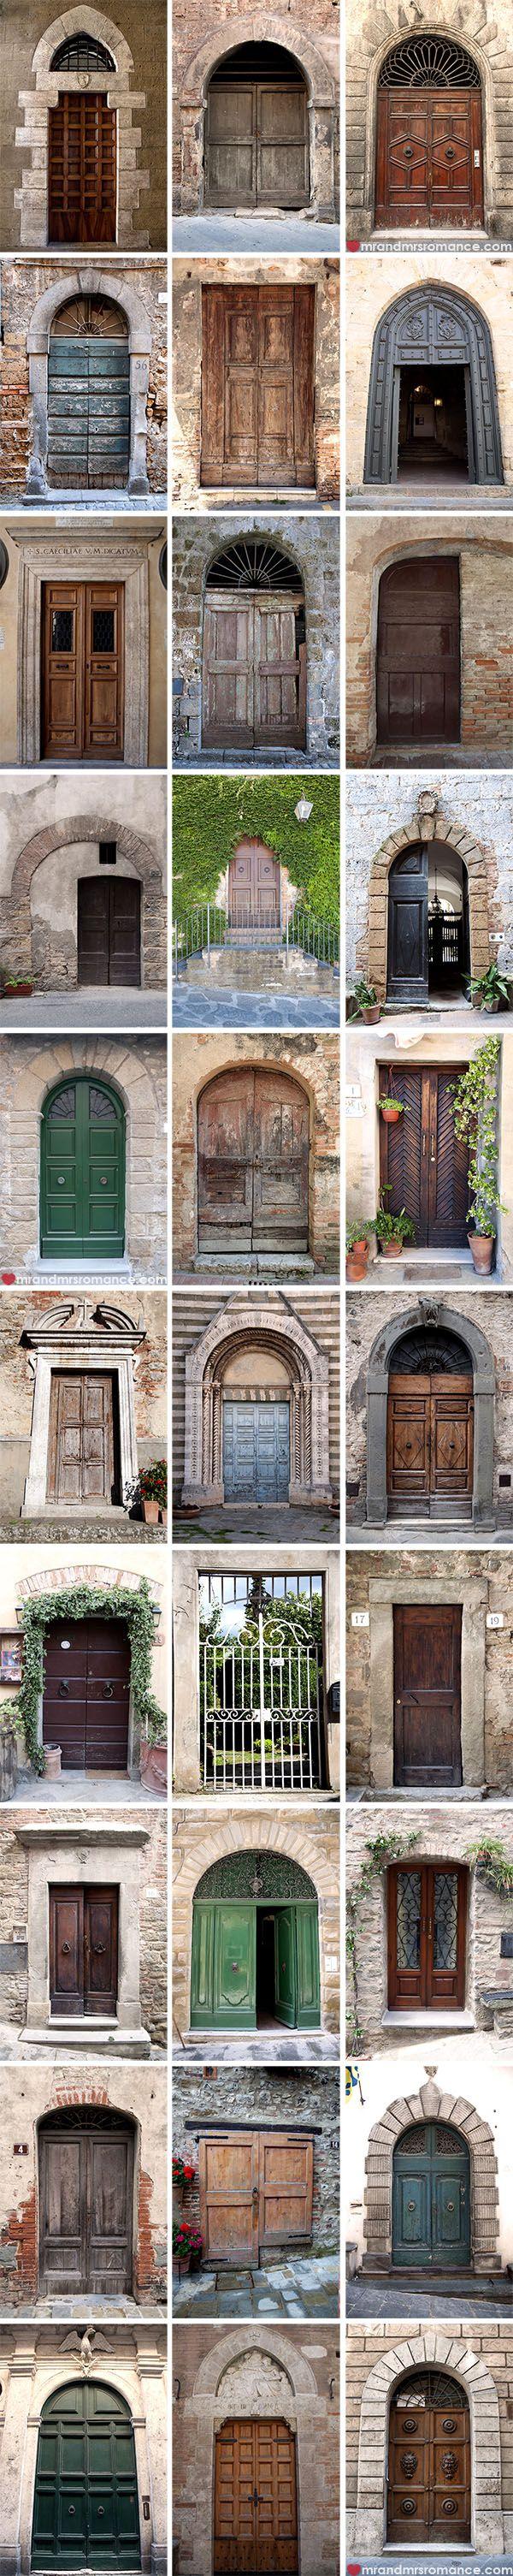 Mr and Mrs Romance - Doors of Tuscany Italy